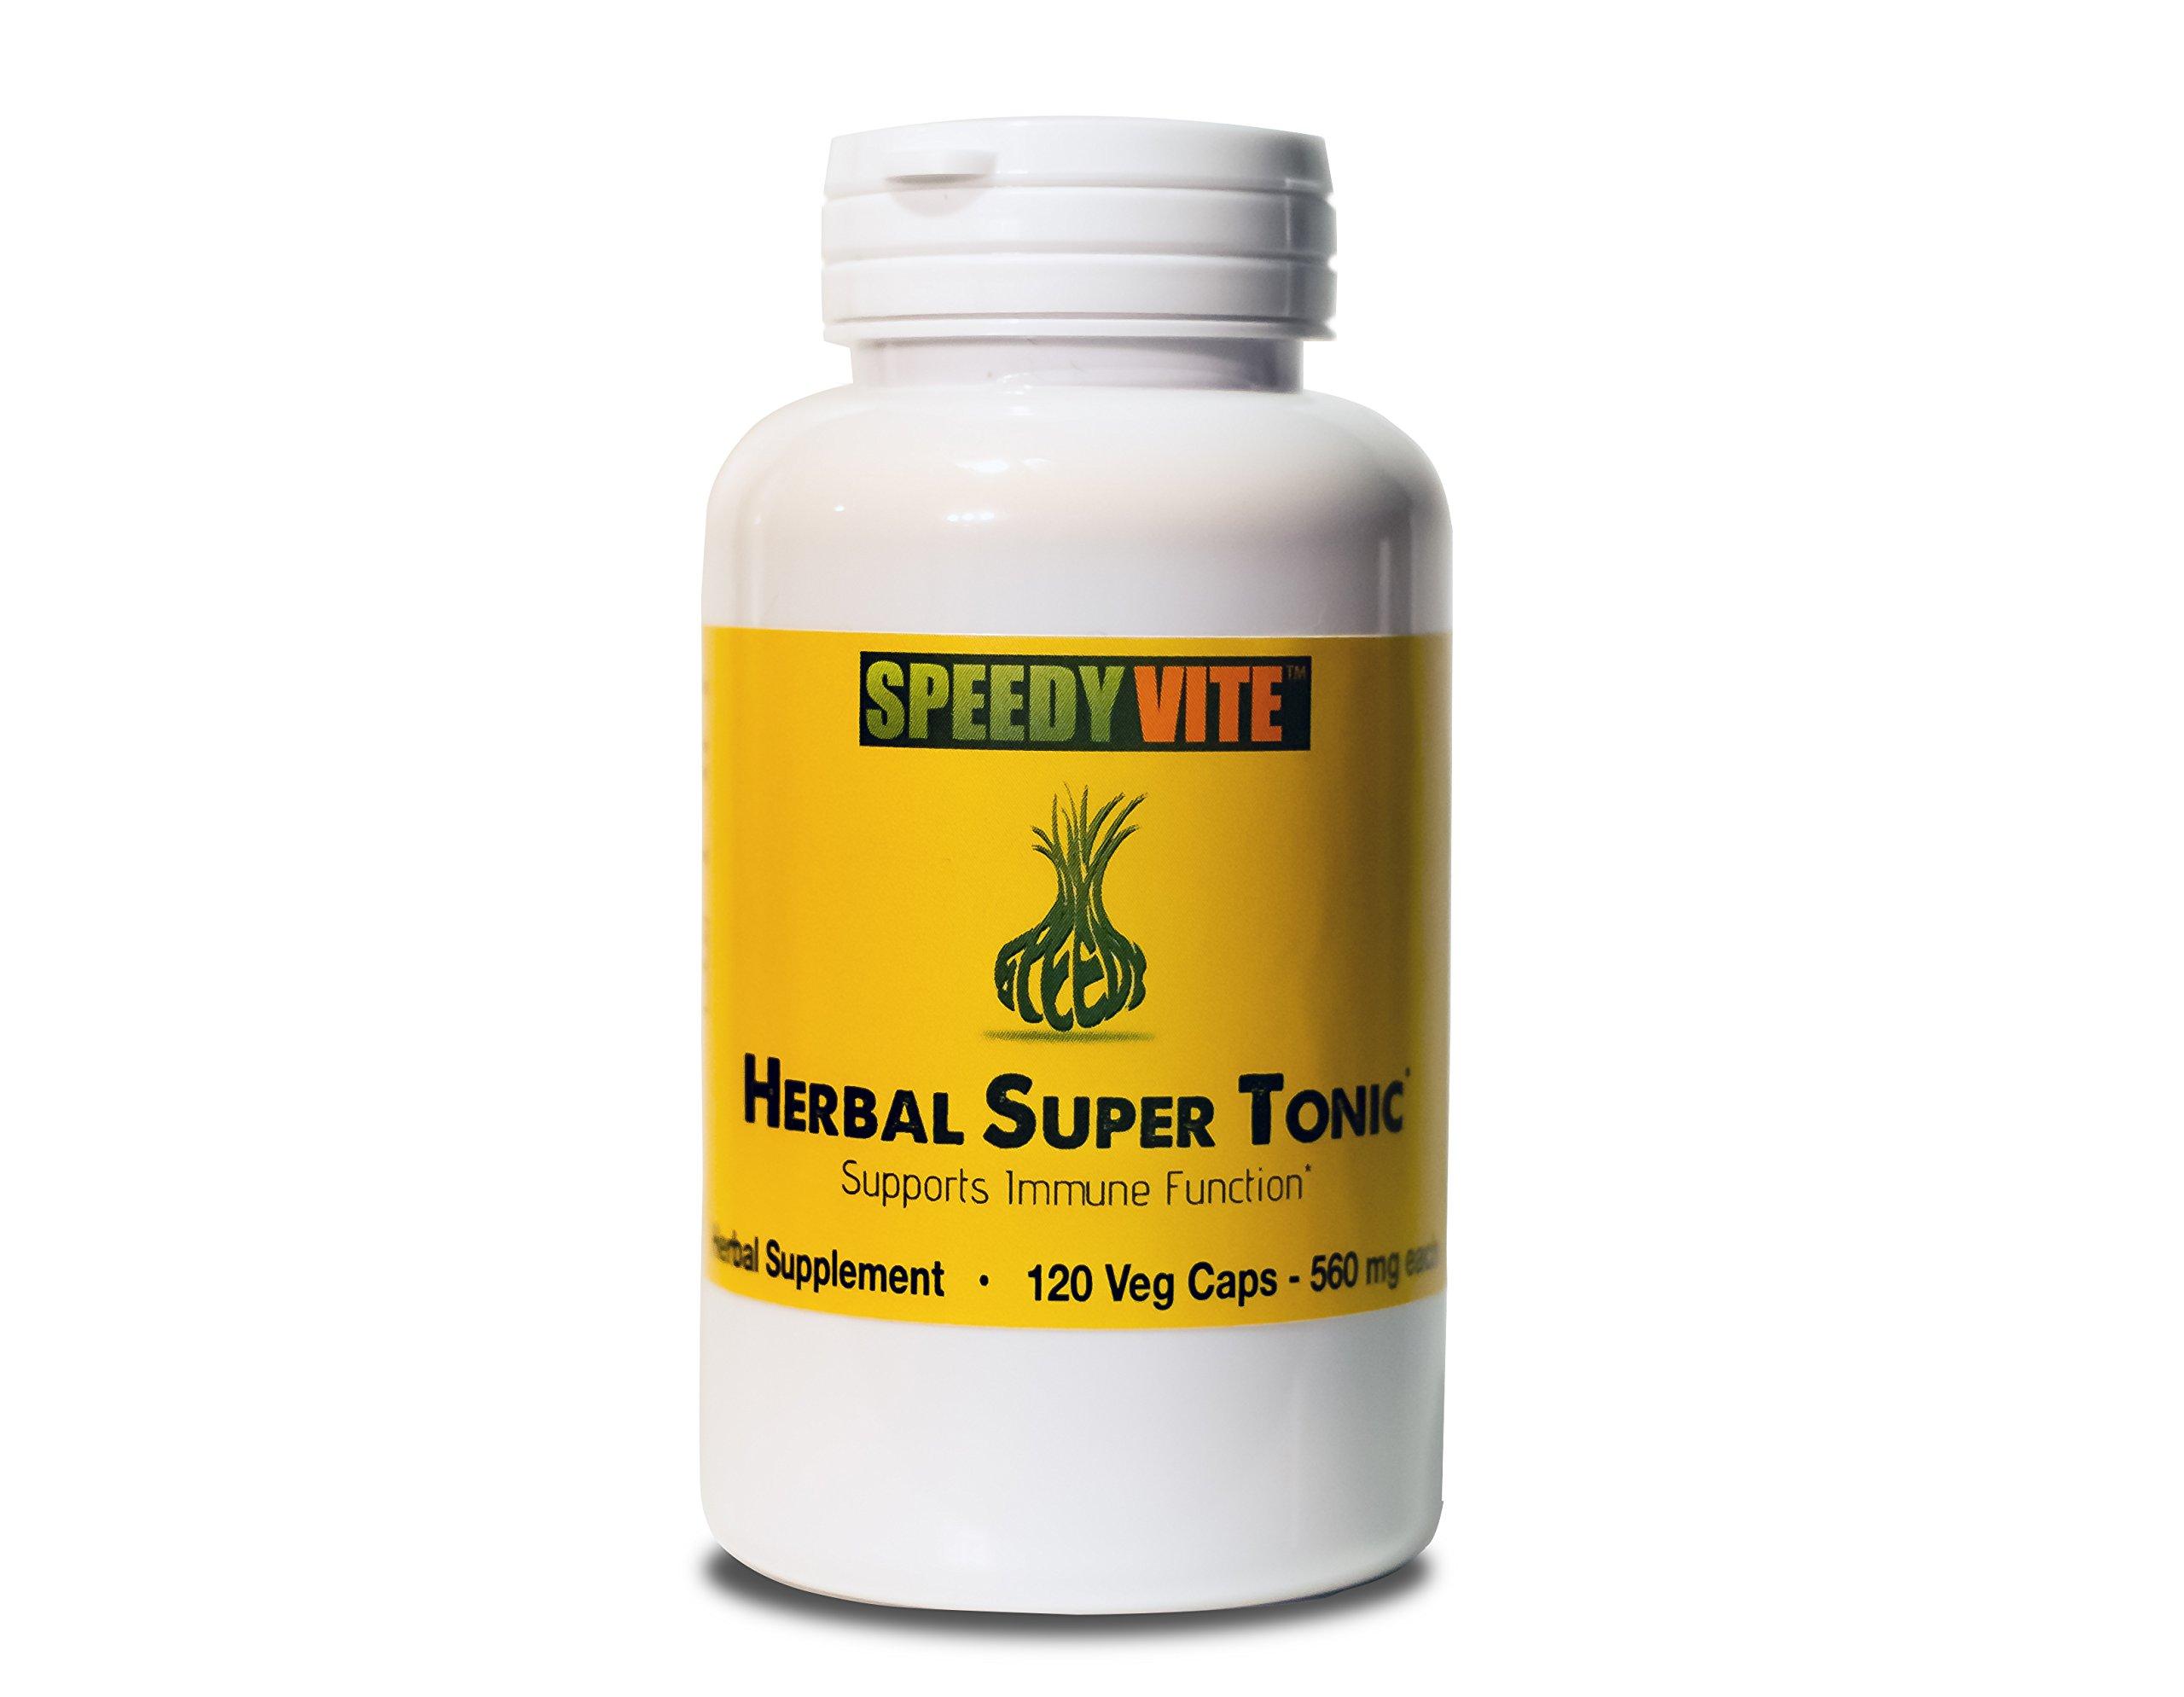 SpeedyVite® Herbal Super Tonic Organic (120 Veg Cap) Apple Cider Vinegar Horseradish Onion Garlic Ginger Cayenne Pepper Natural wildcrafted Supports Immune Function*